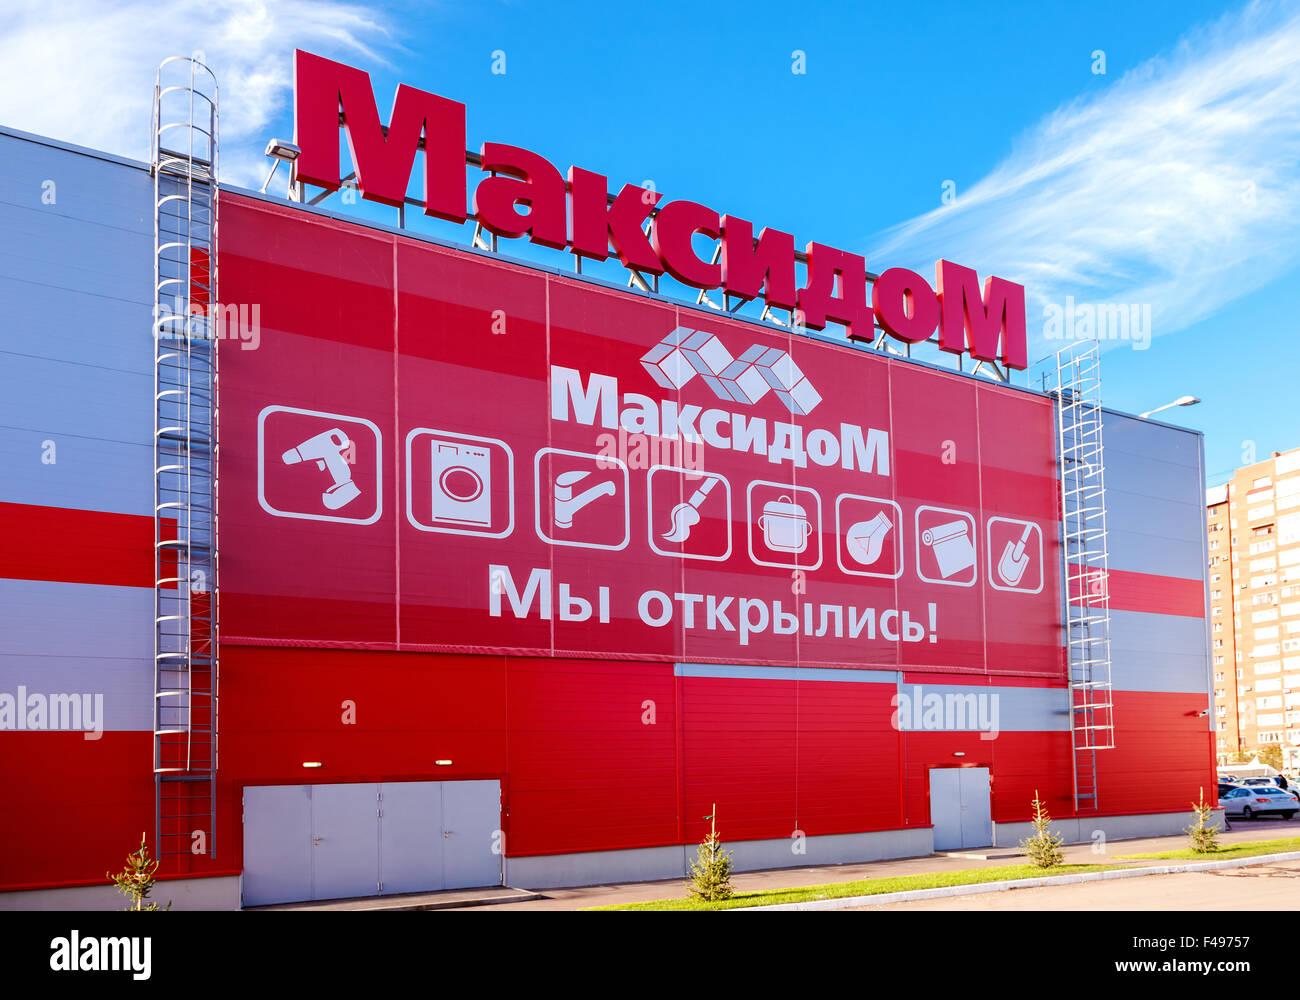 Maksidom Samara Store. Maksidom - network of hypermarkets of goods for construction - Stock Image